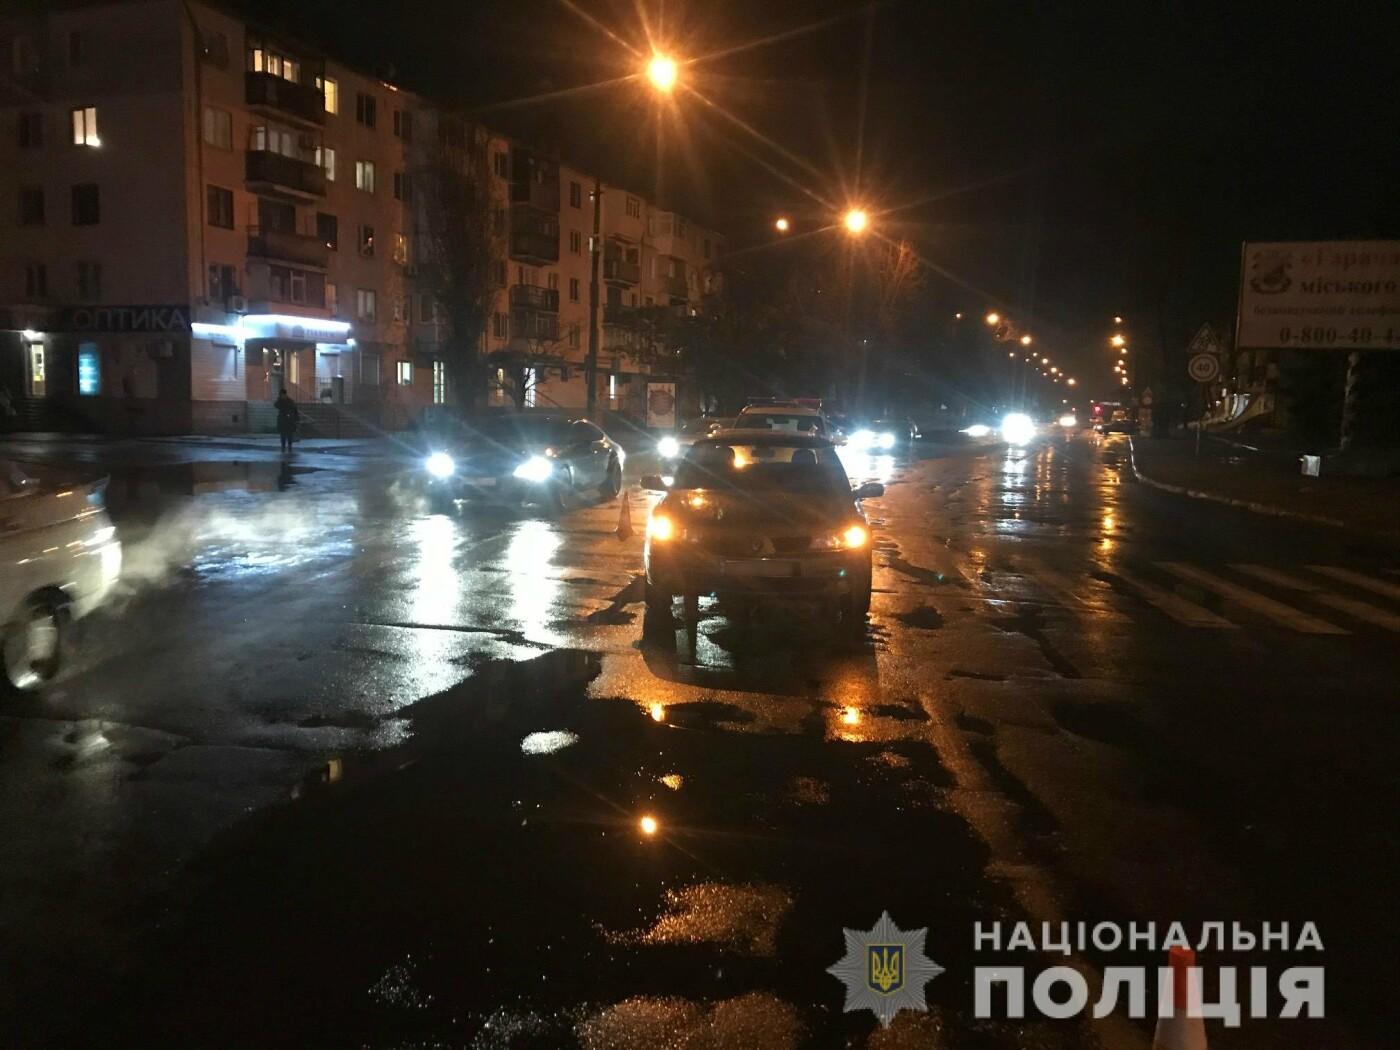 На Днепропетровщине сбили женщину: полиция ищет свидетелей аварии, - ФОТО, фото-1